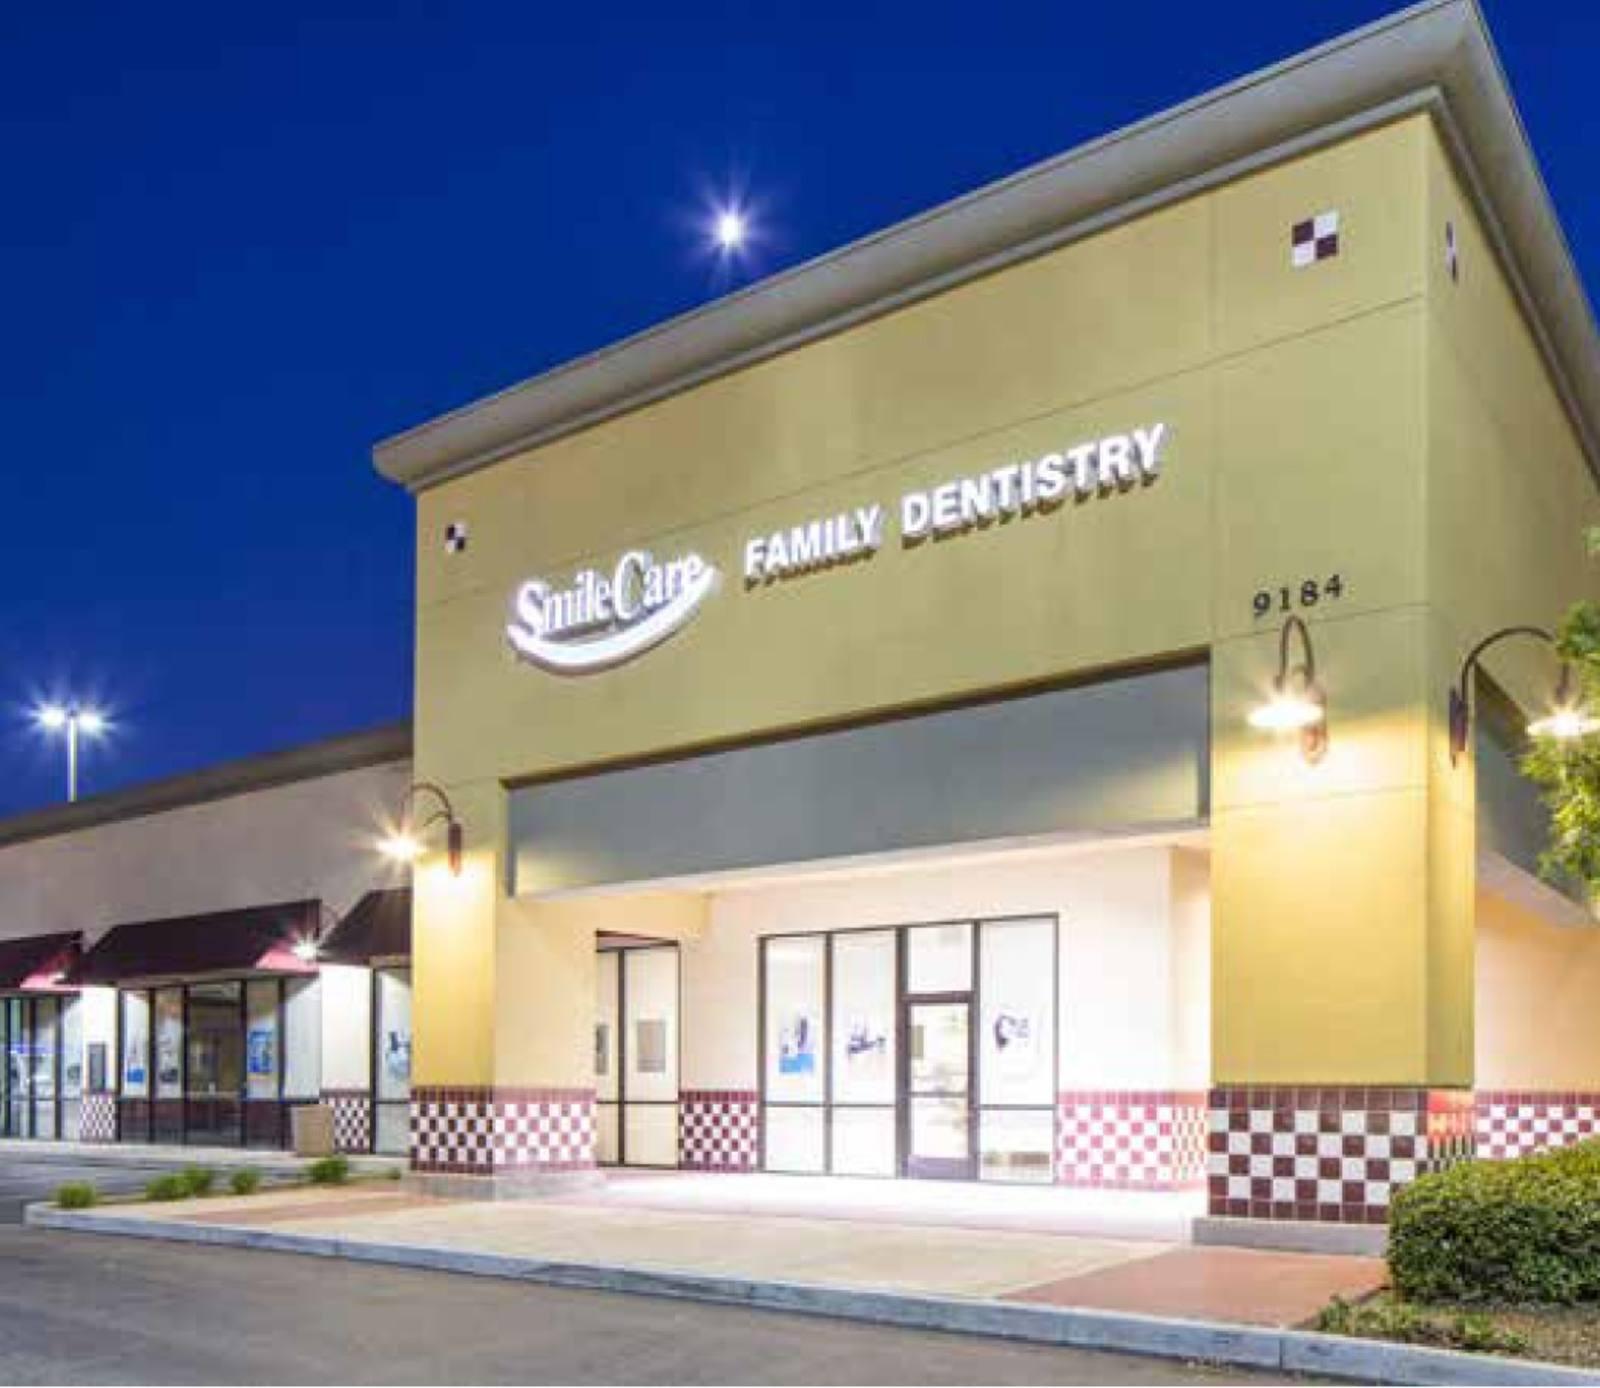 CBRE RetailMarketplace 999134 E Stockton Blvd  Photo